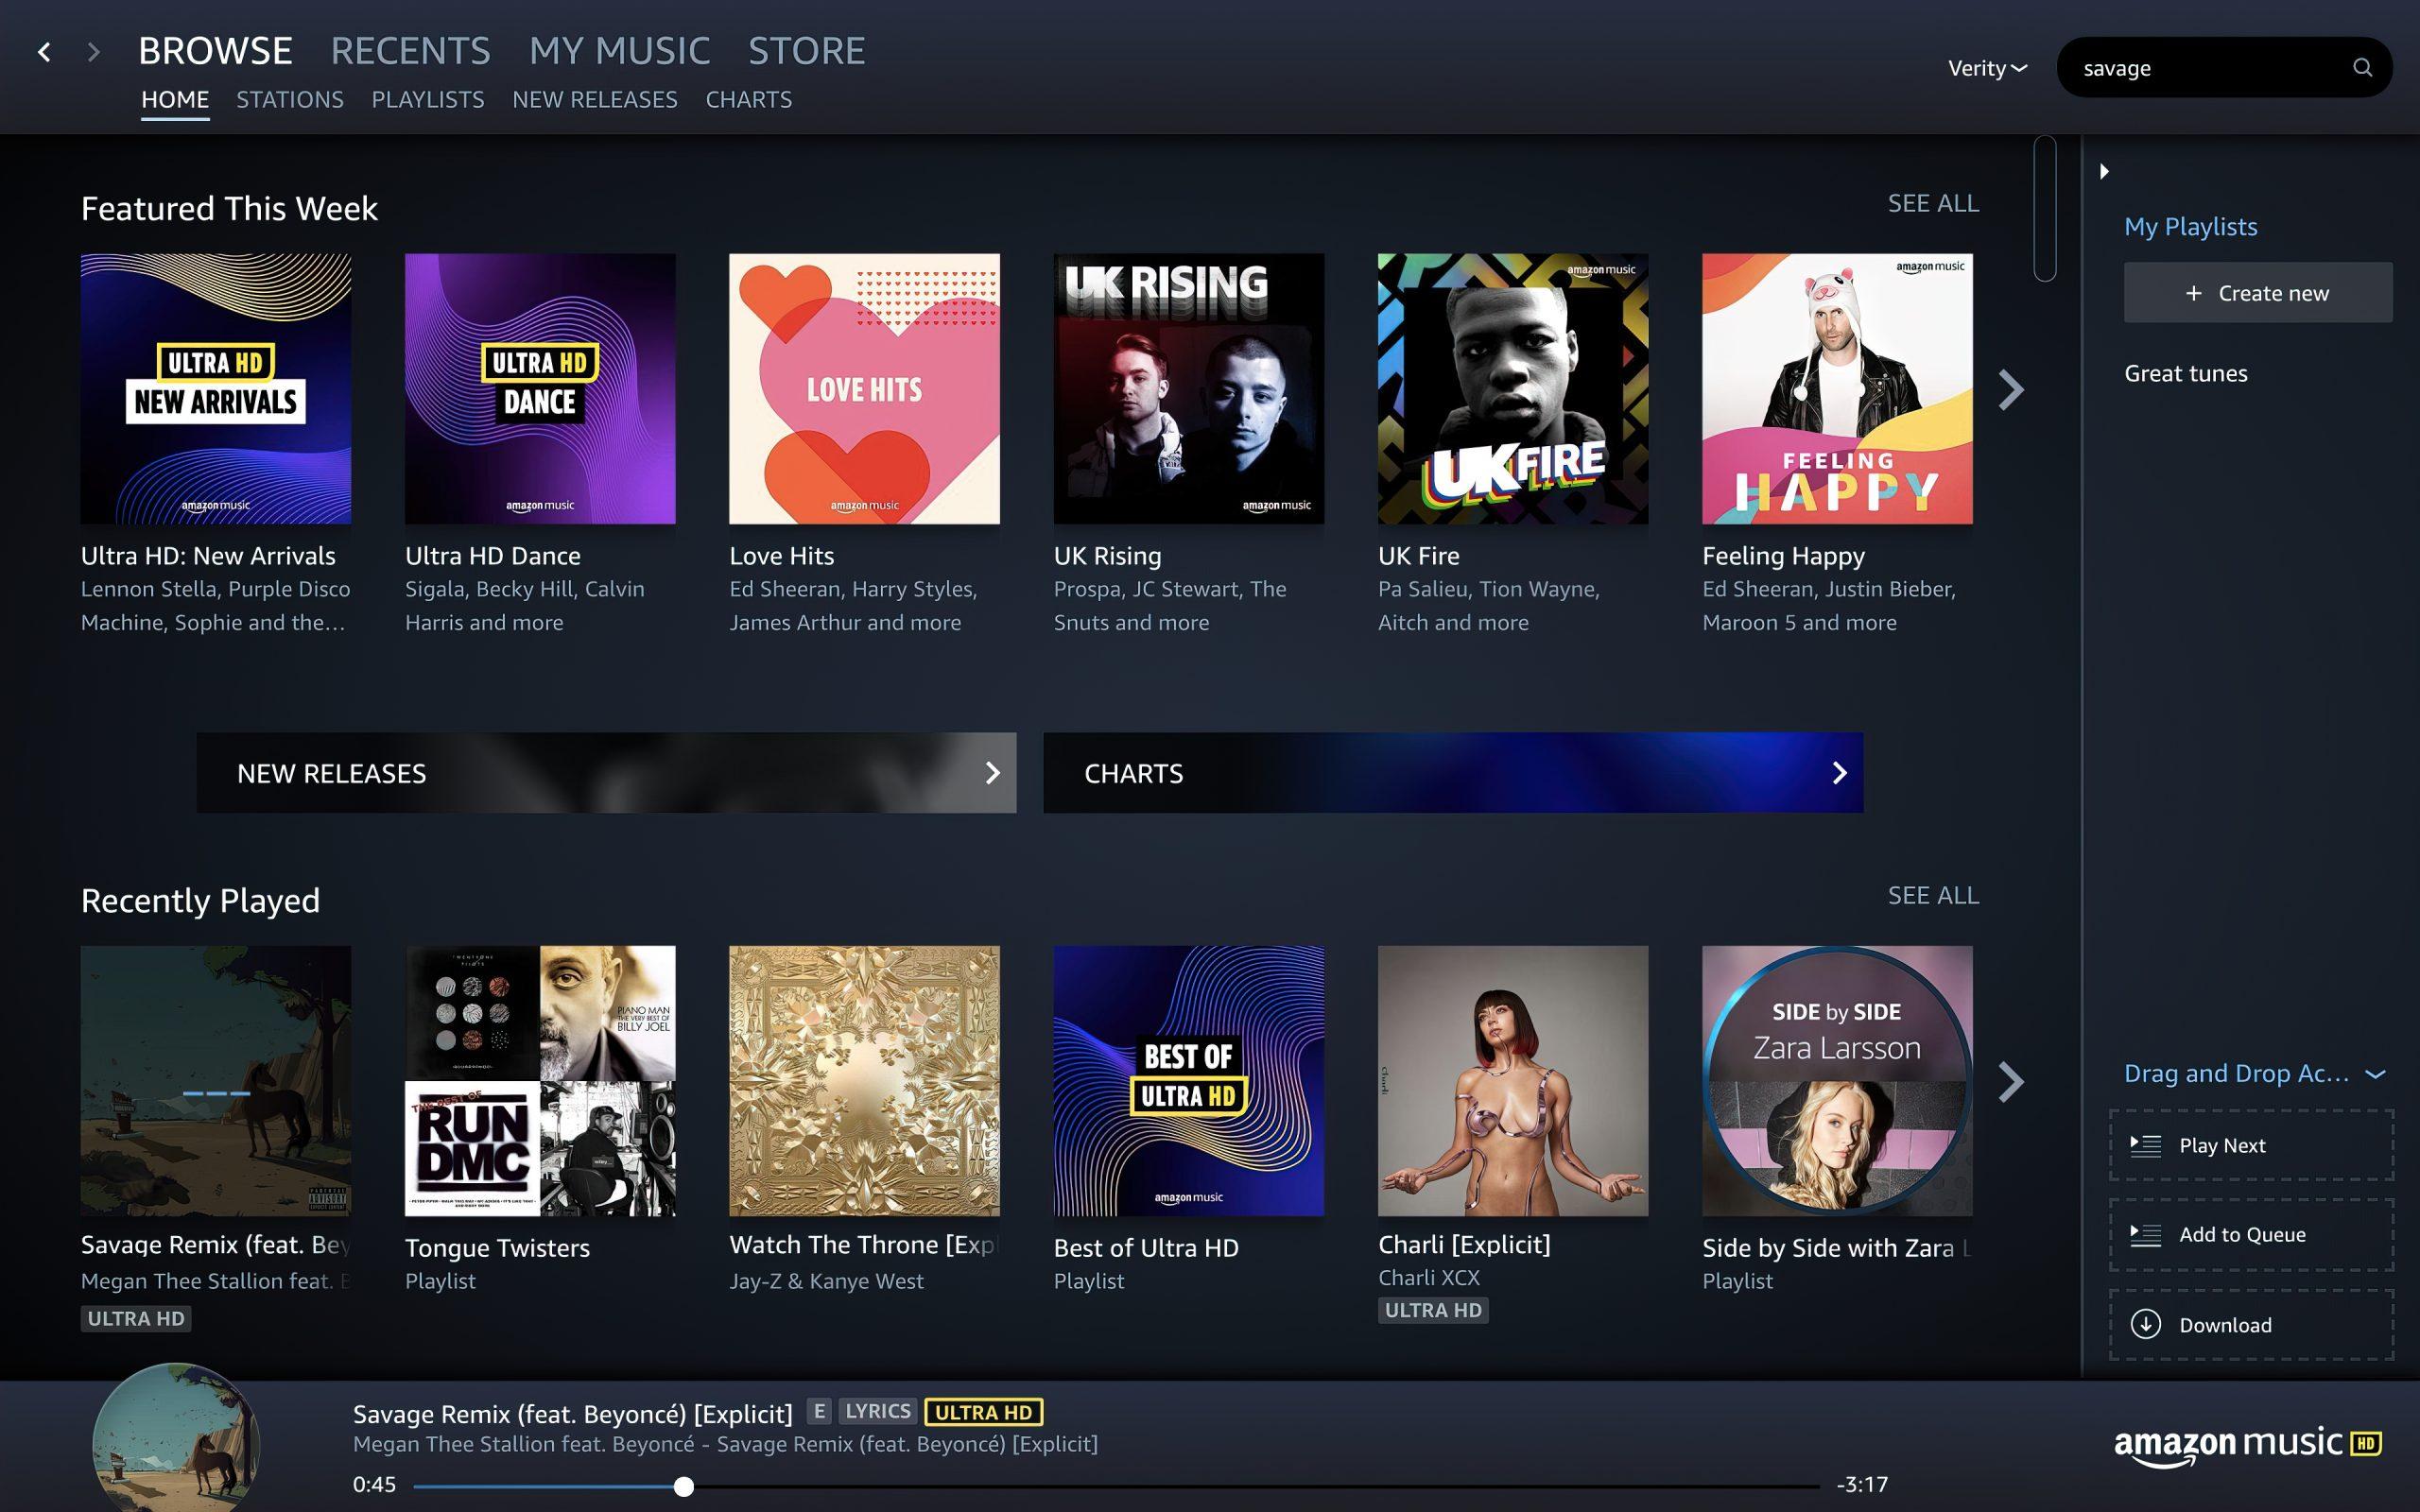 Amazon Music HD hires hi-res strømming streaming høyoppløst